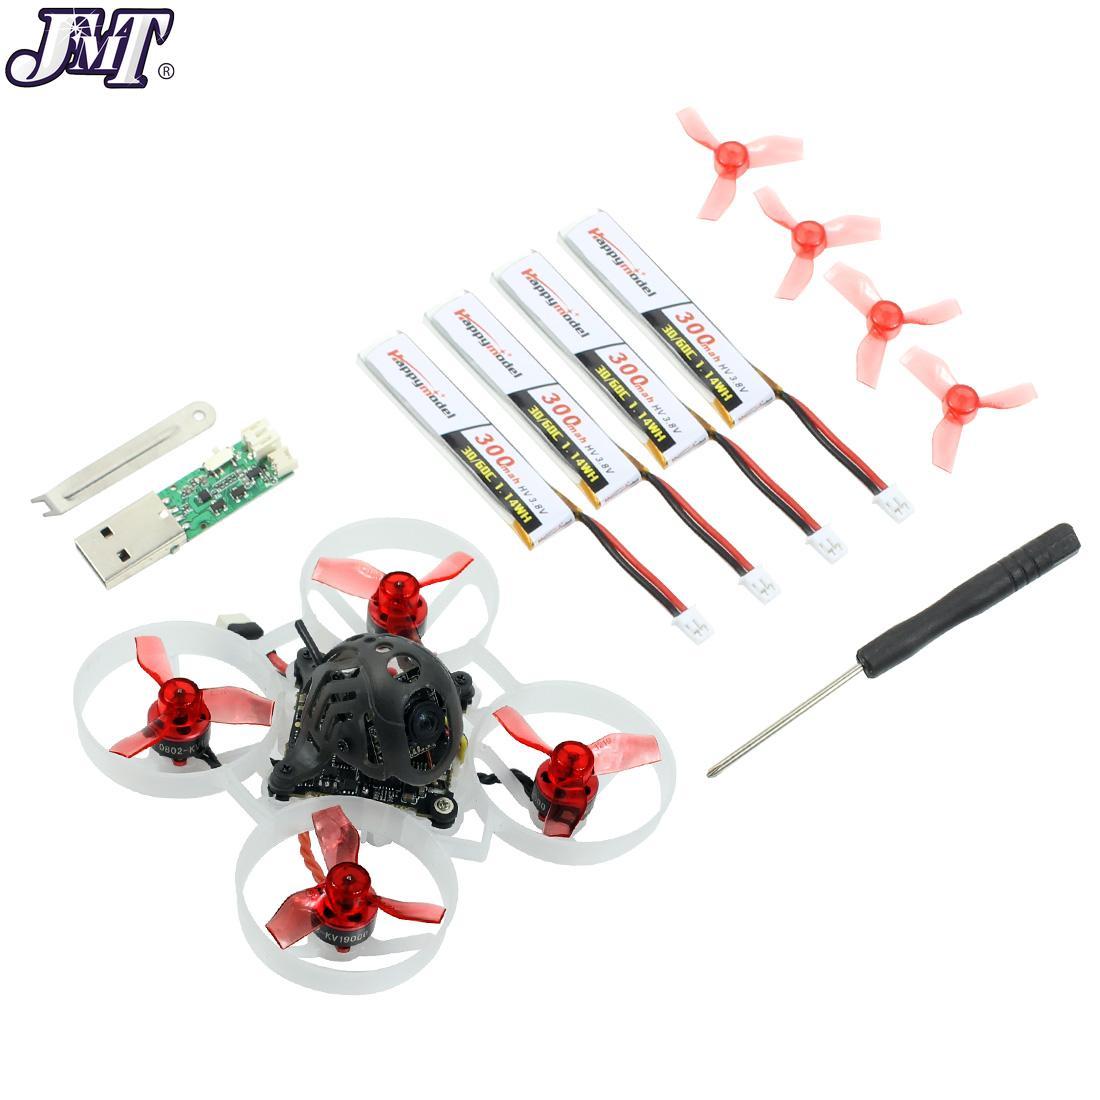 JMT Mobula6 HD Mobula 6 1S 65 مللي متر فرش Bwhoop FPV سباق Drone مع 4in1 Crazybee F4 لايت Runcam Nano3 بلاي Happymodel